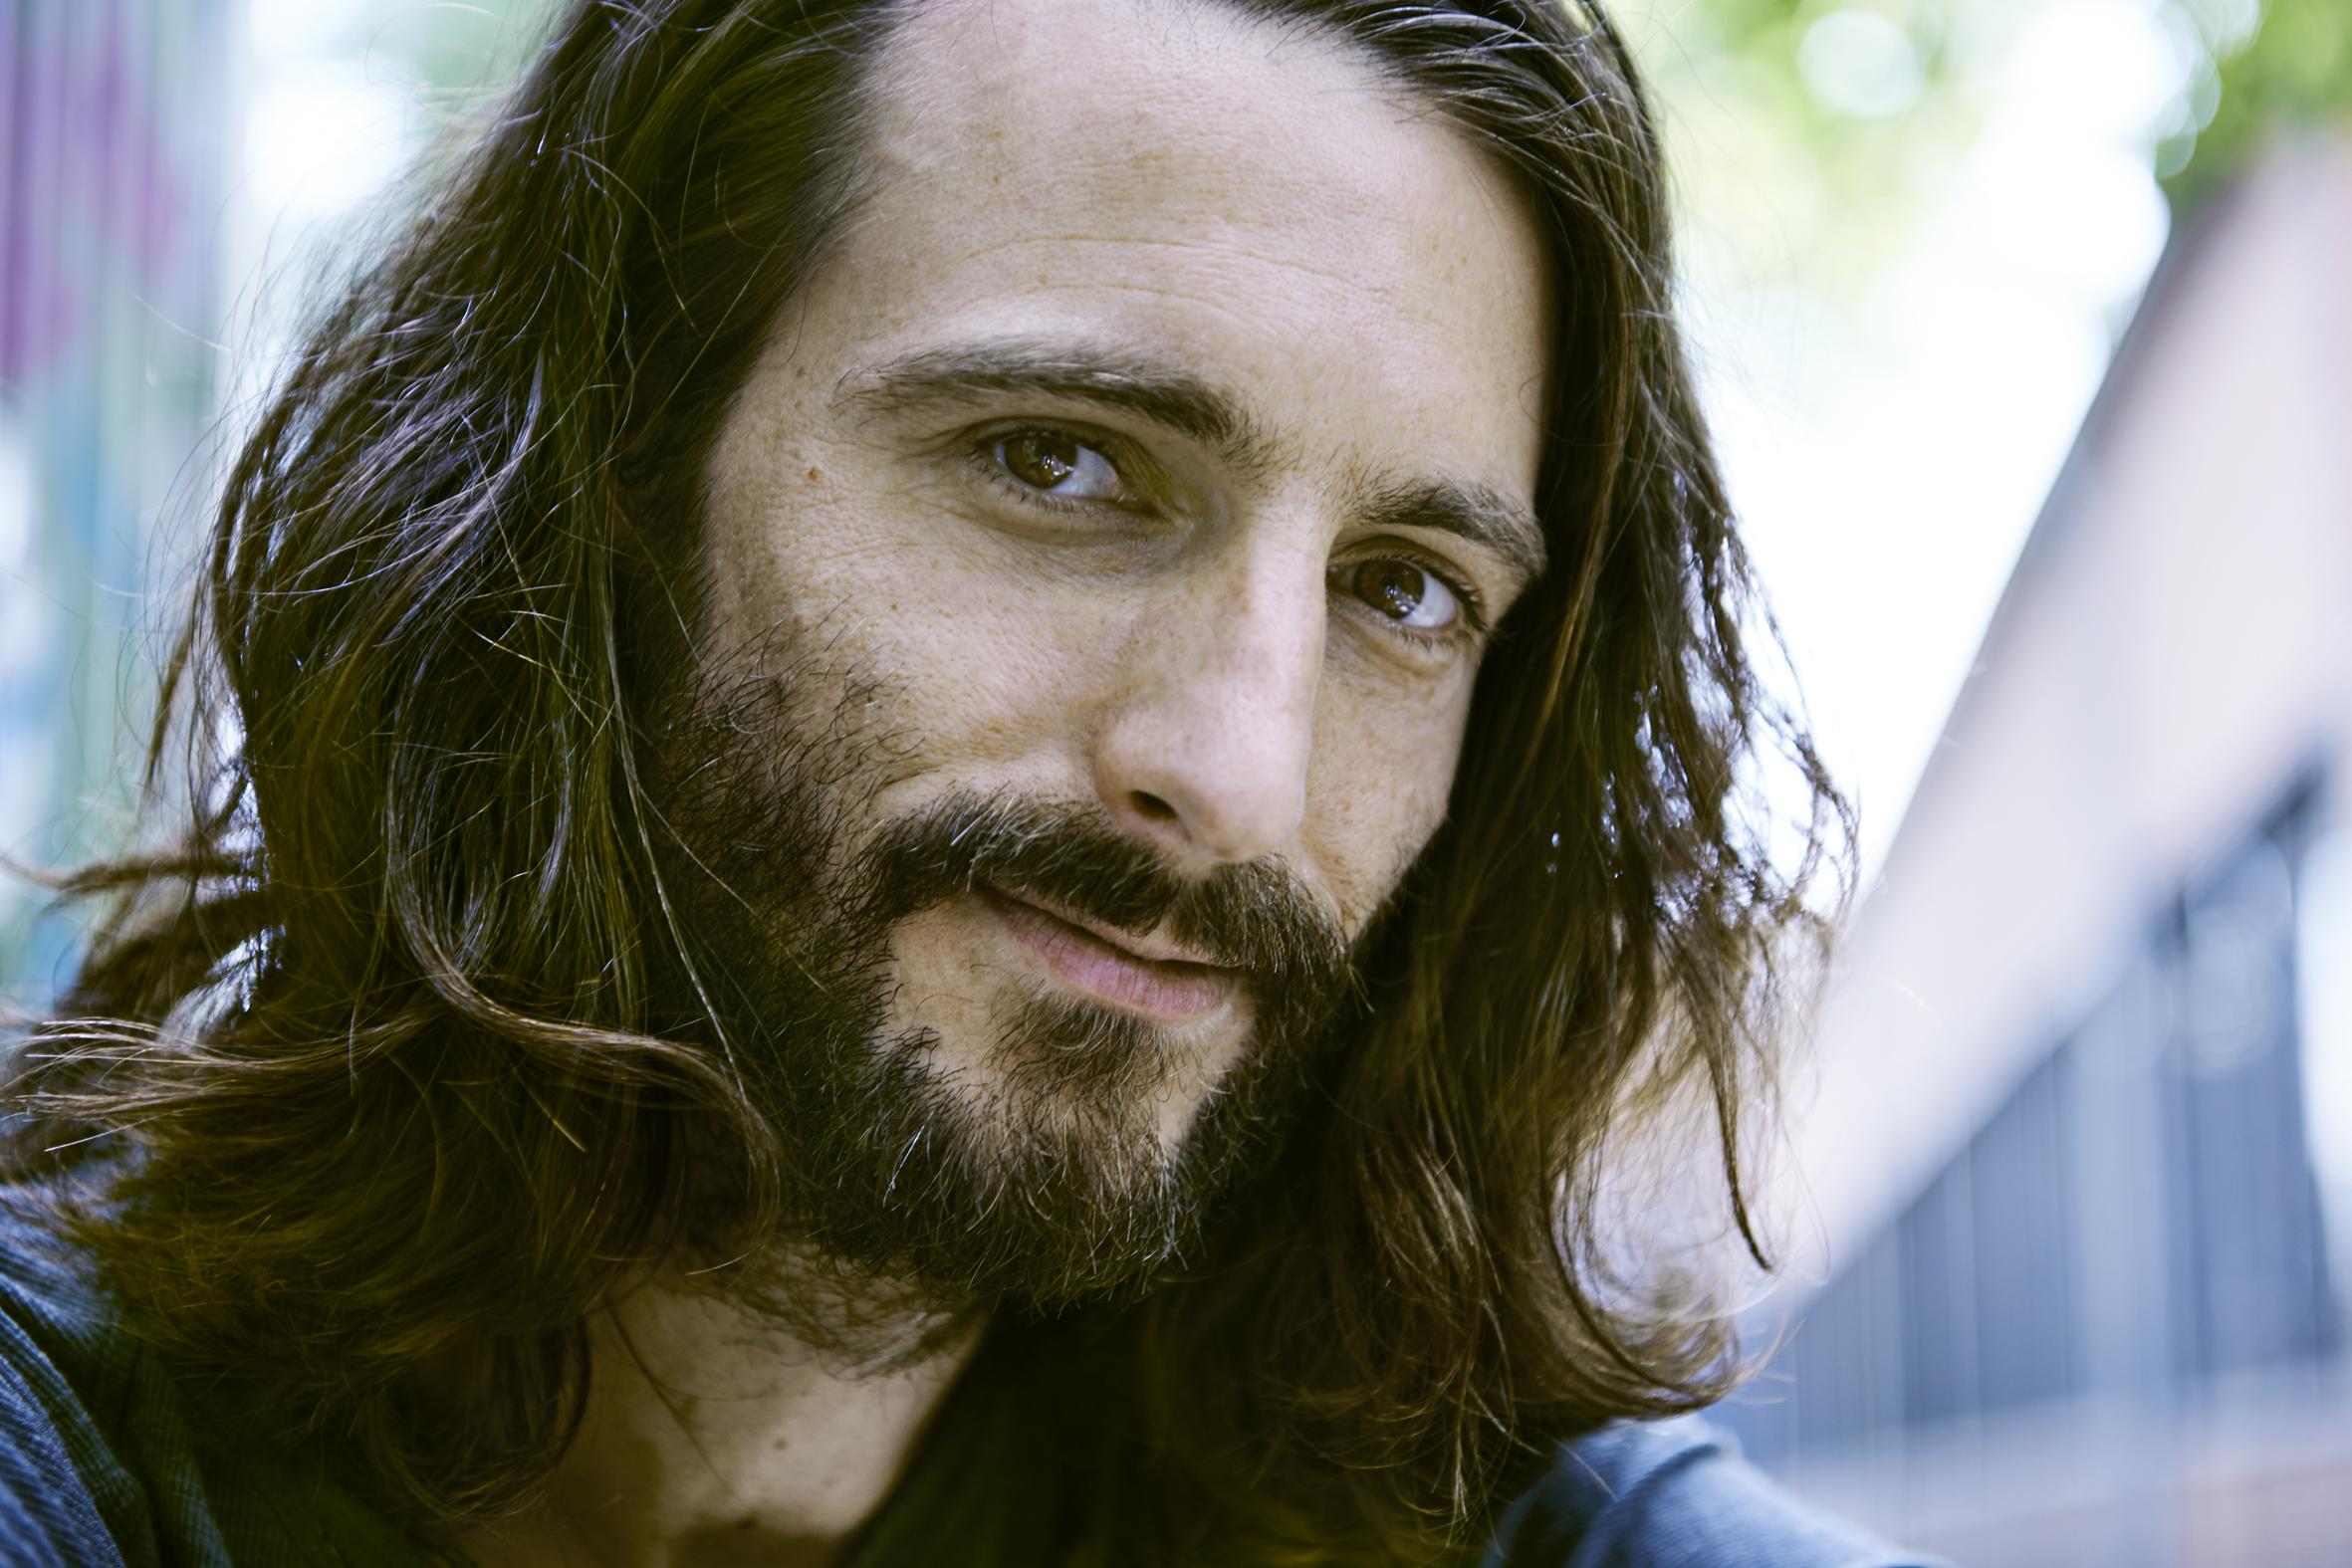 Luc-Mueller-Schauspieler-2016-171.jpg